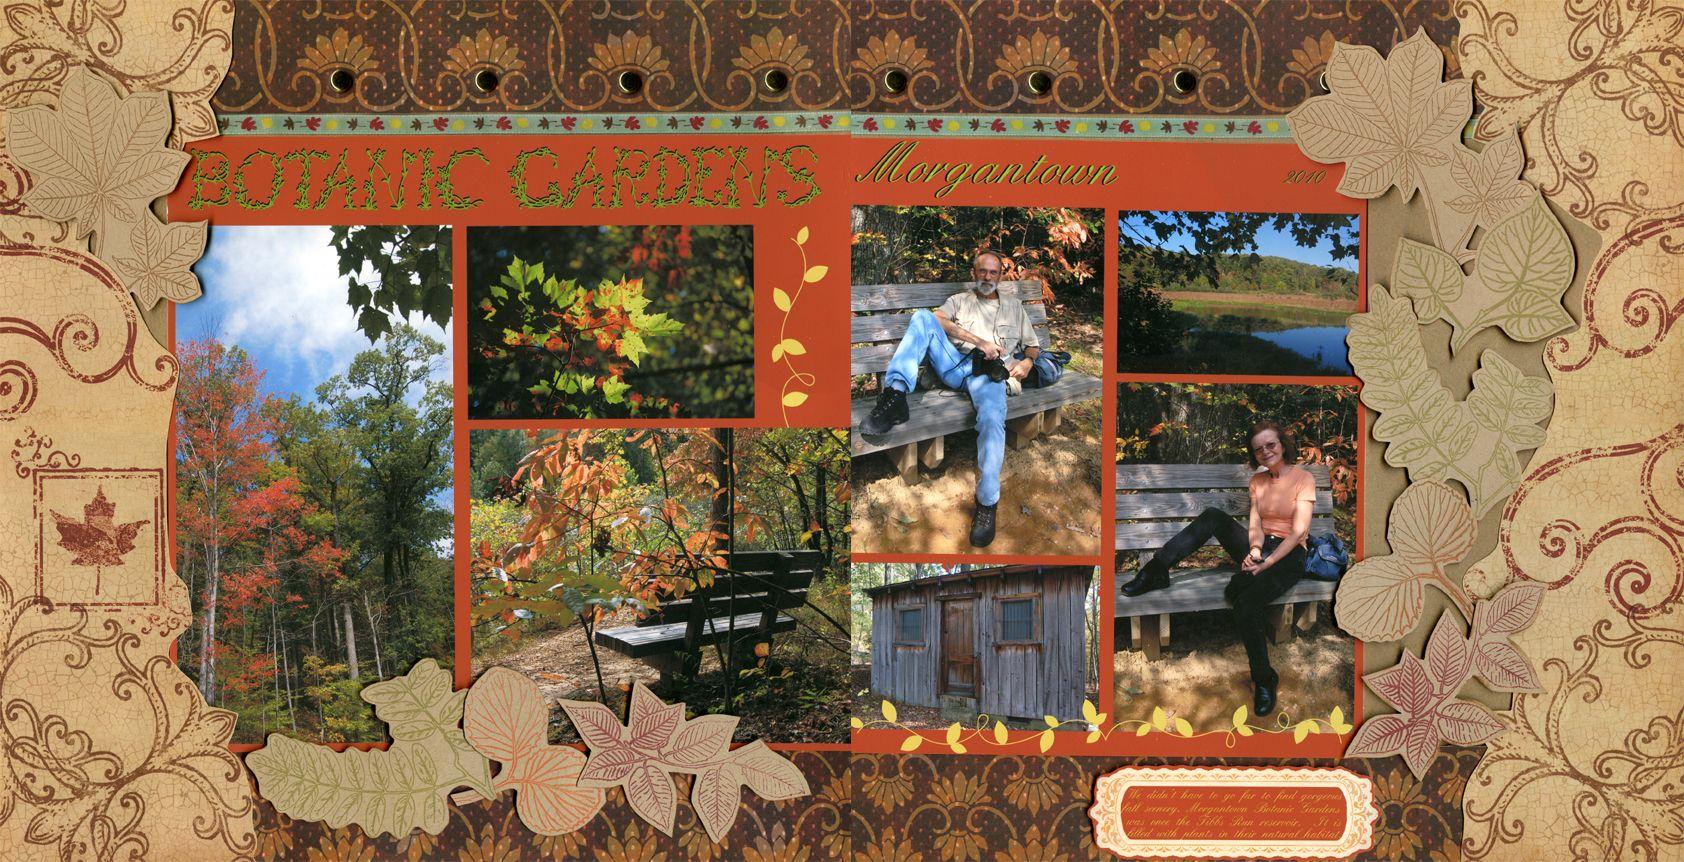 Botanic Gardens Morgantown - Scrapbook.com